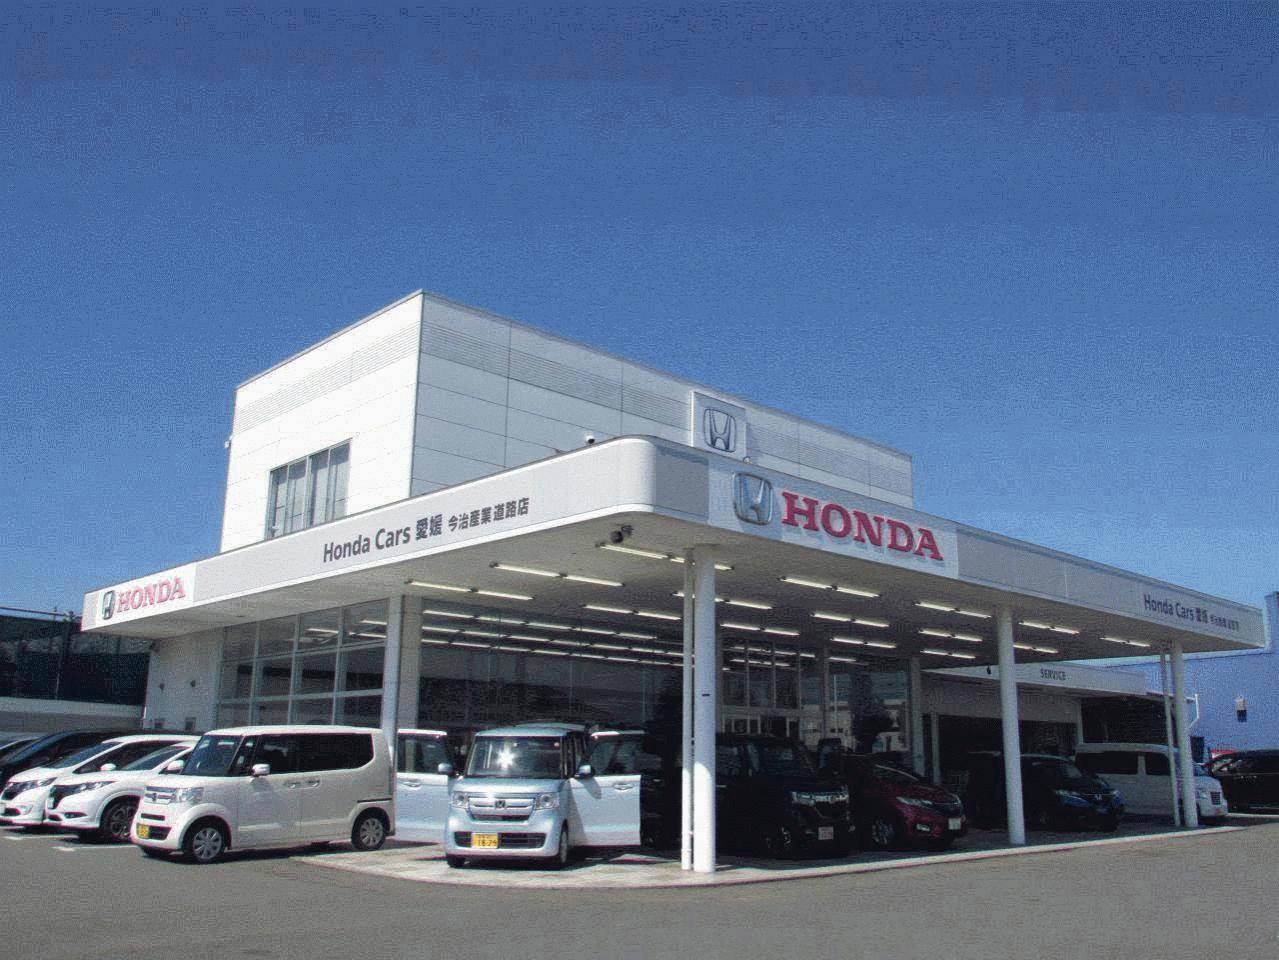 Honda Cars 愛媛 今治産業道路店 (認定中古車取扱店)